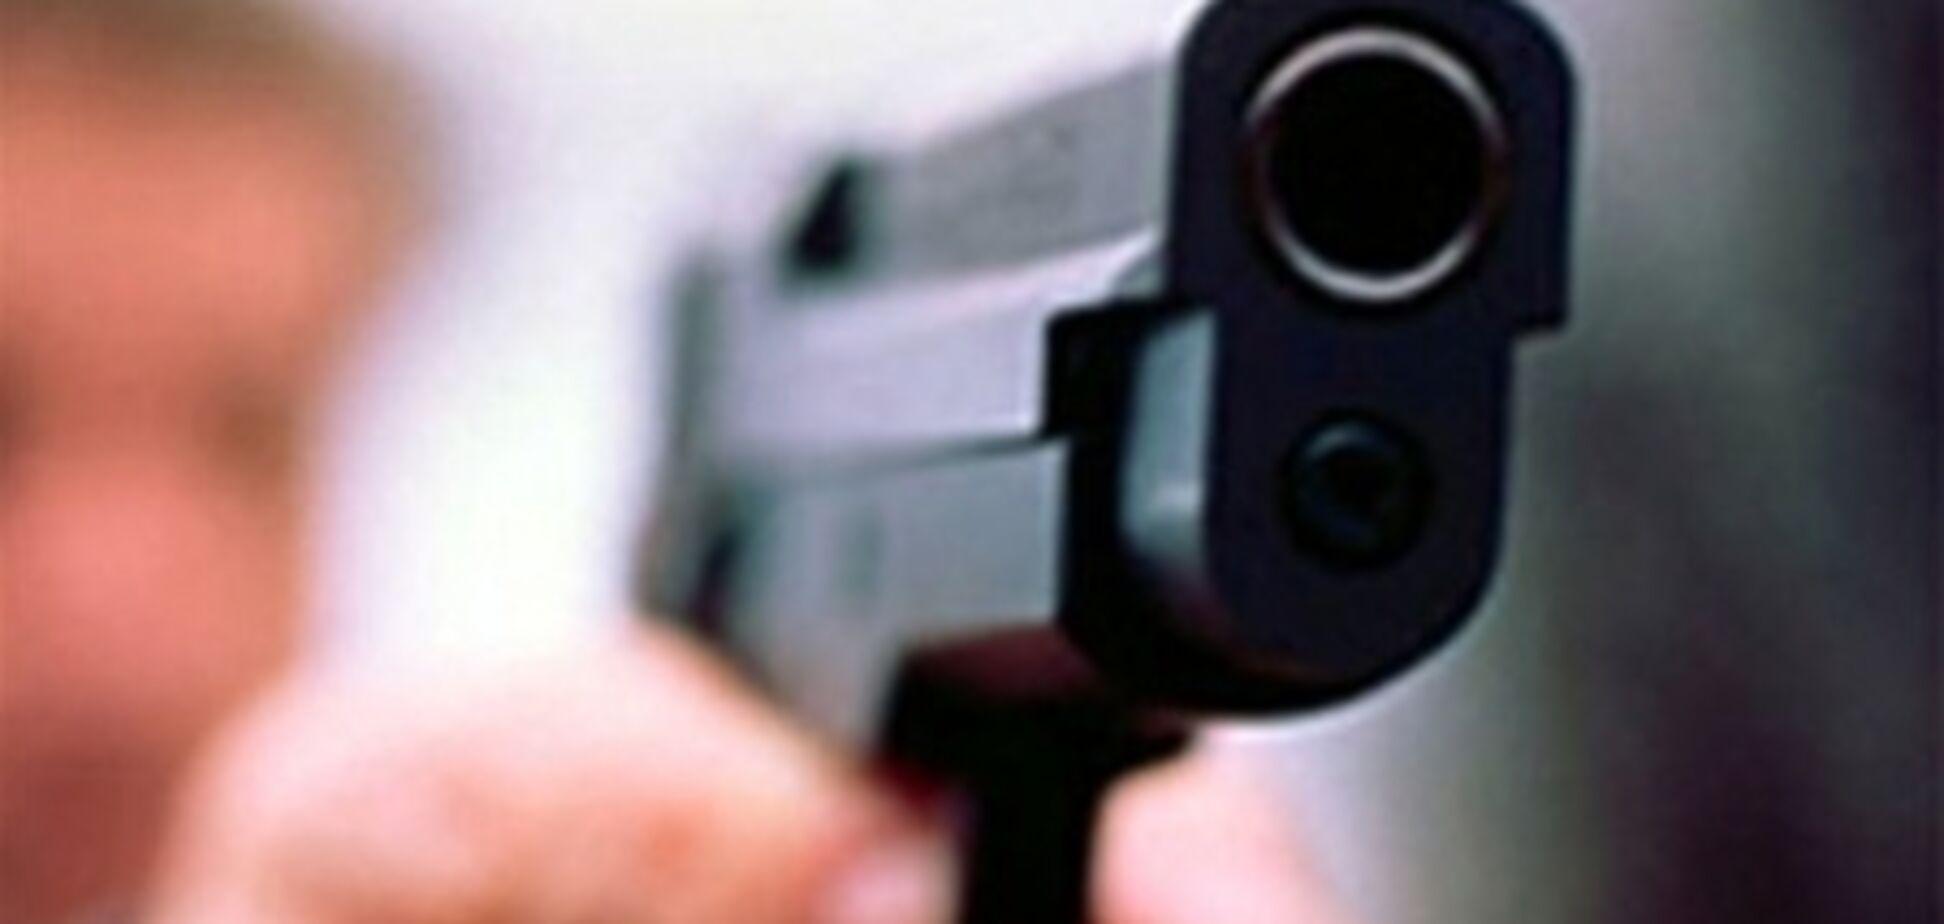 В Измаиле ищут участника разбойного нападения на диско-клуб